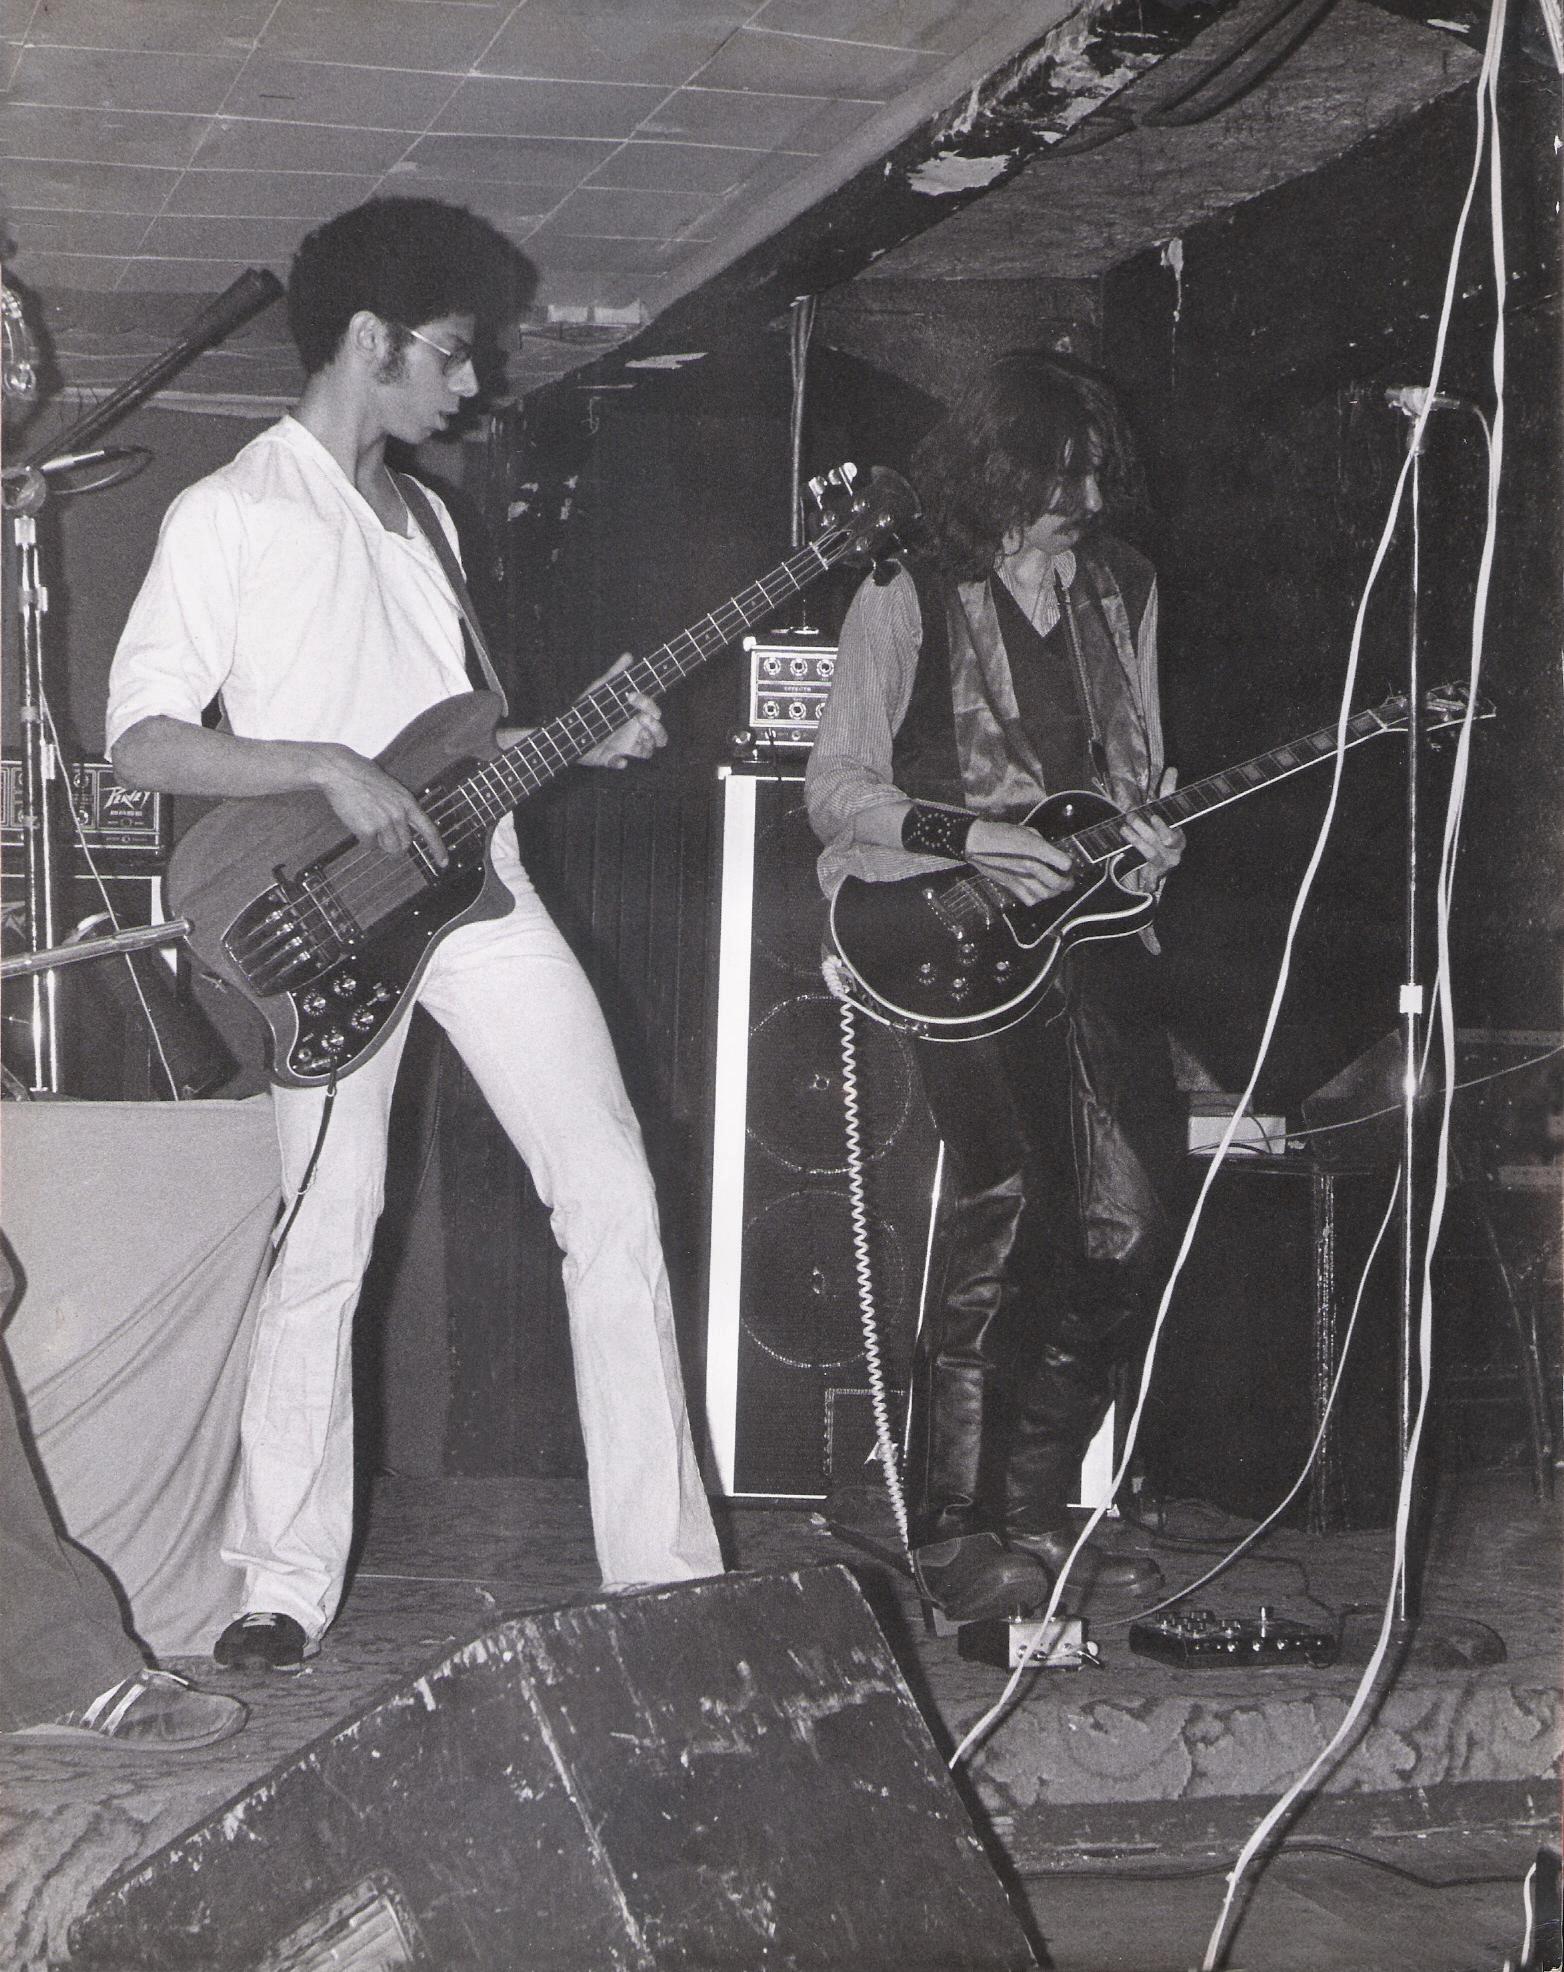 Bob Lowden and Garth Huels